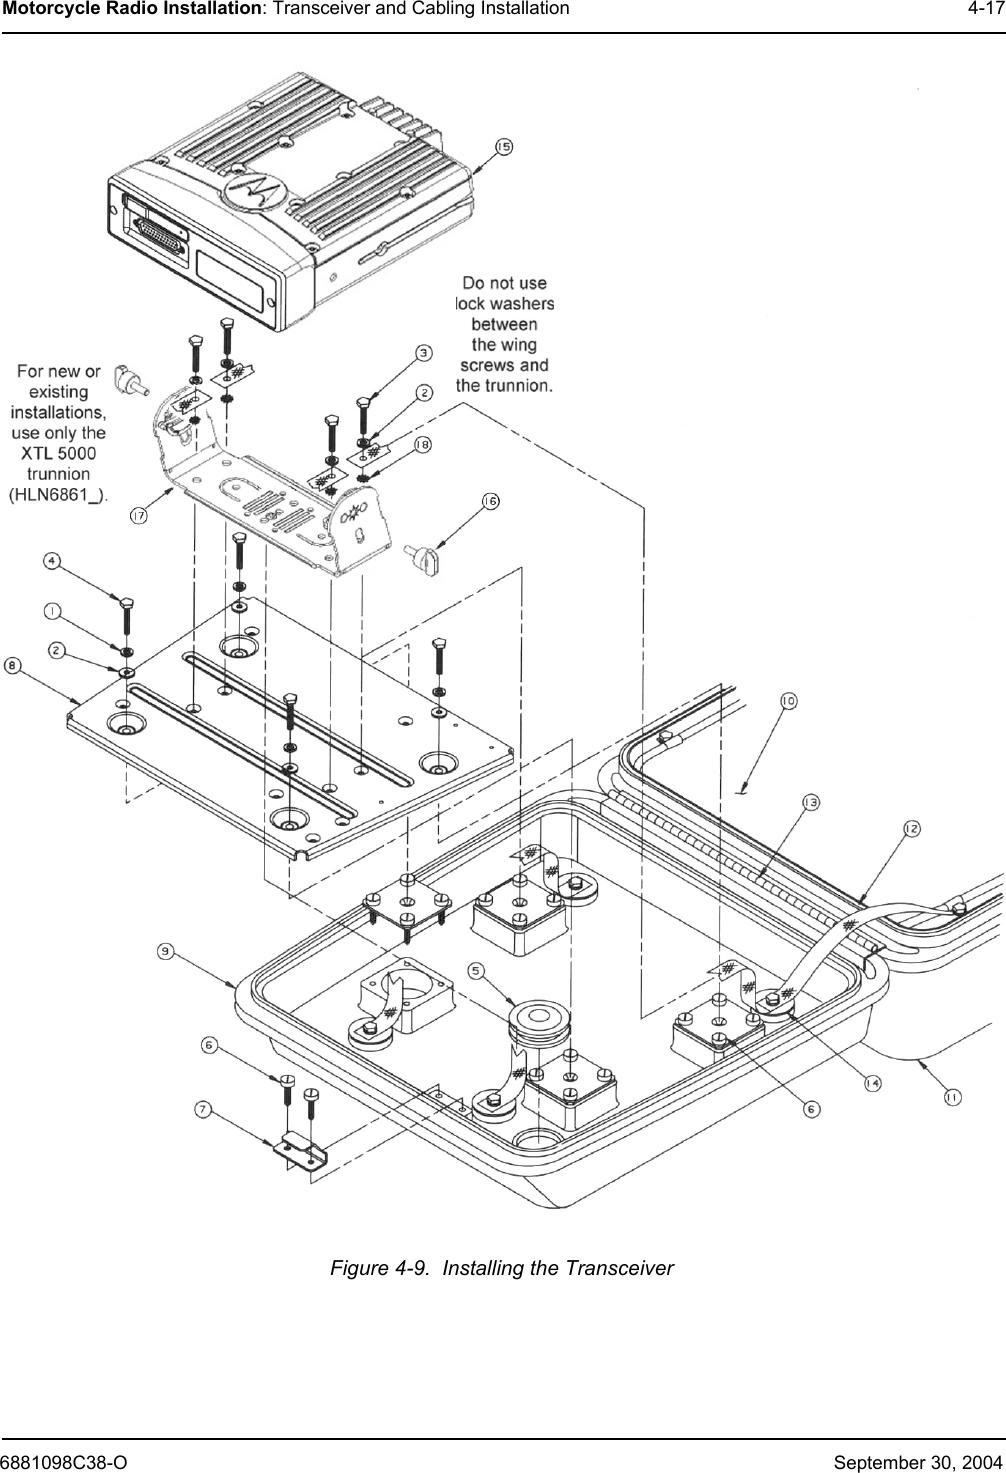 Magnificent Motorola Cdm1250 Wiring Diagram Basic Electronics Wiring Diagram Wiring 101 Olytiaxxcnl